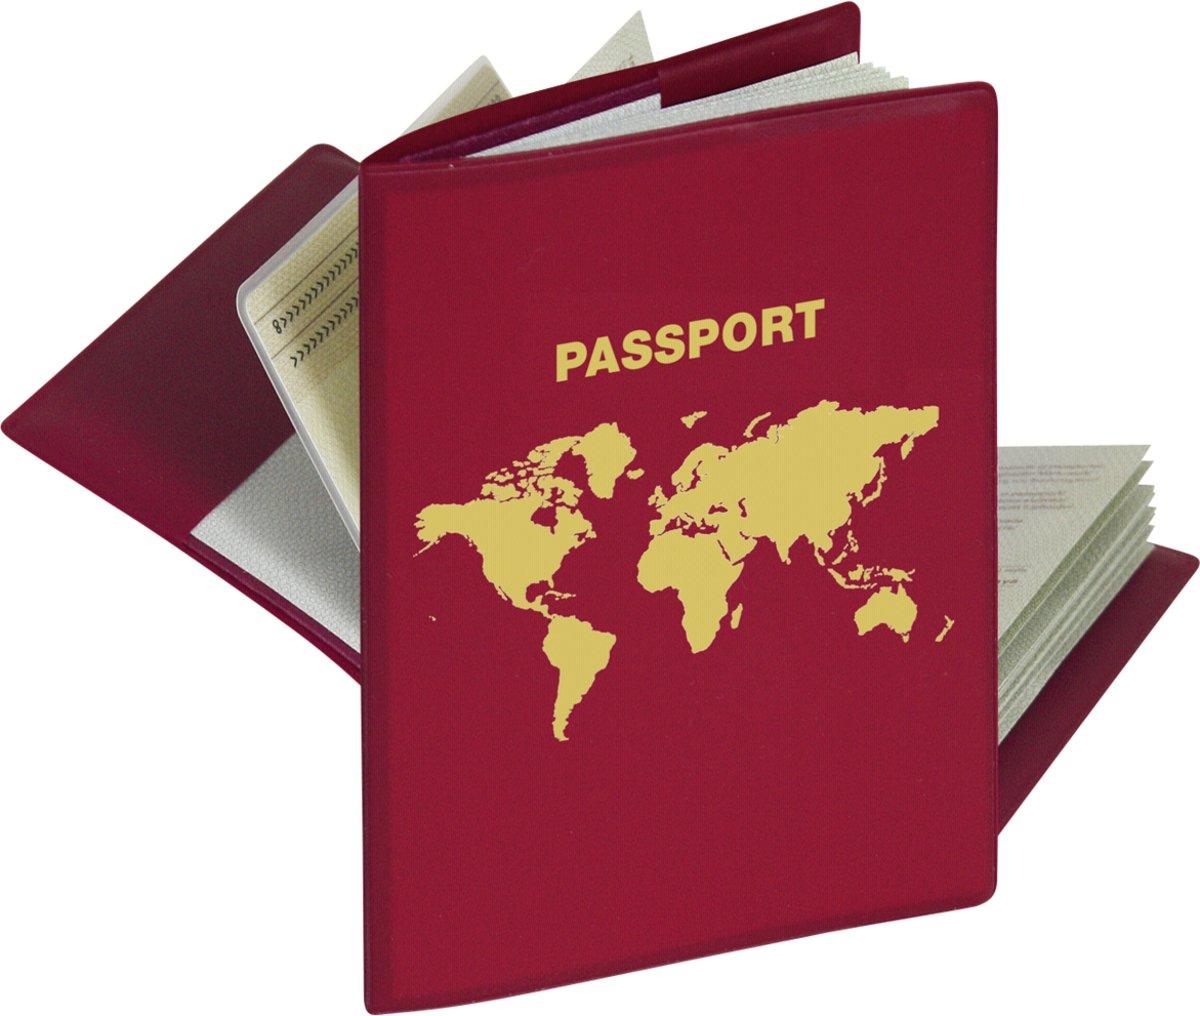 Herma RFID-Beschermhoes paspoort 1 Hoes met 2 binnenvakken 5549N